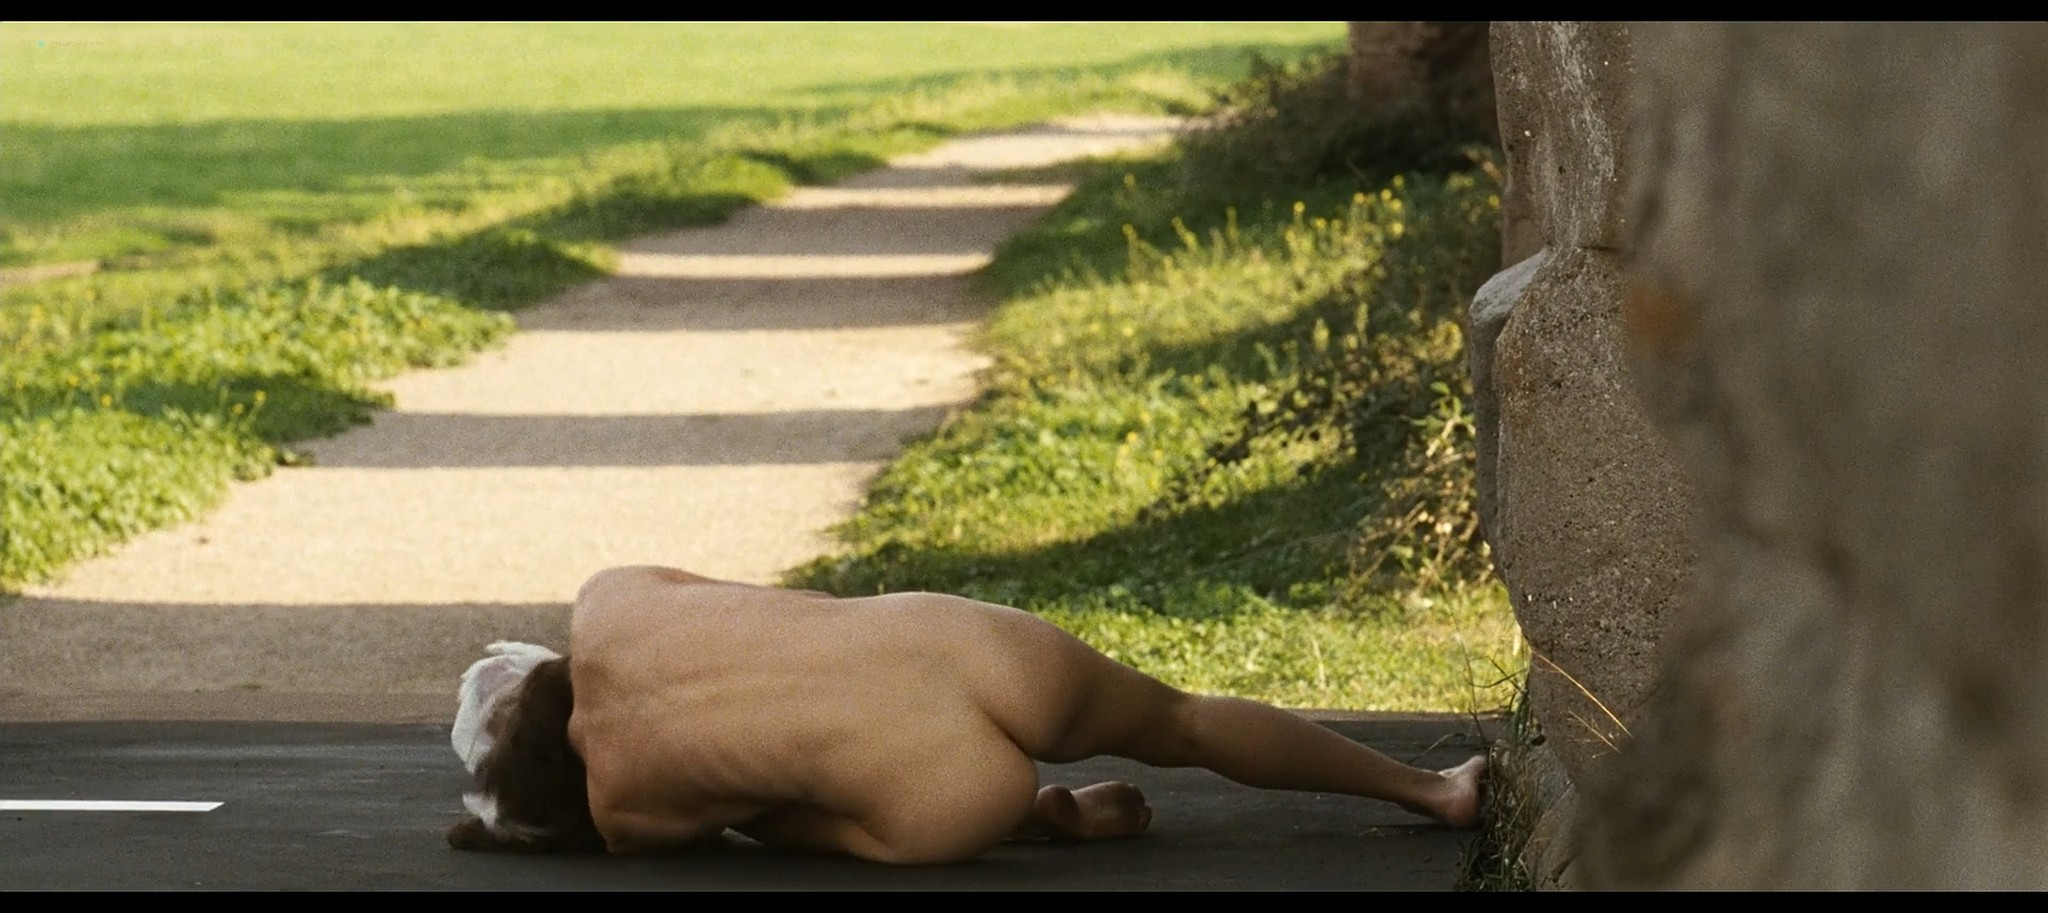 Sabrina Ferilli nude Anita Kravos full frontal Galatea Ranzi and others nude and sexy The Great Beauty IT 2013 1080p BluRey 5